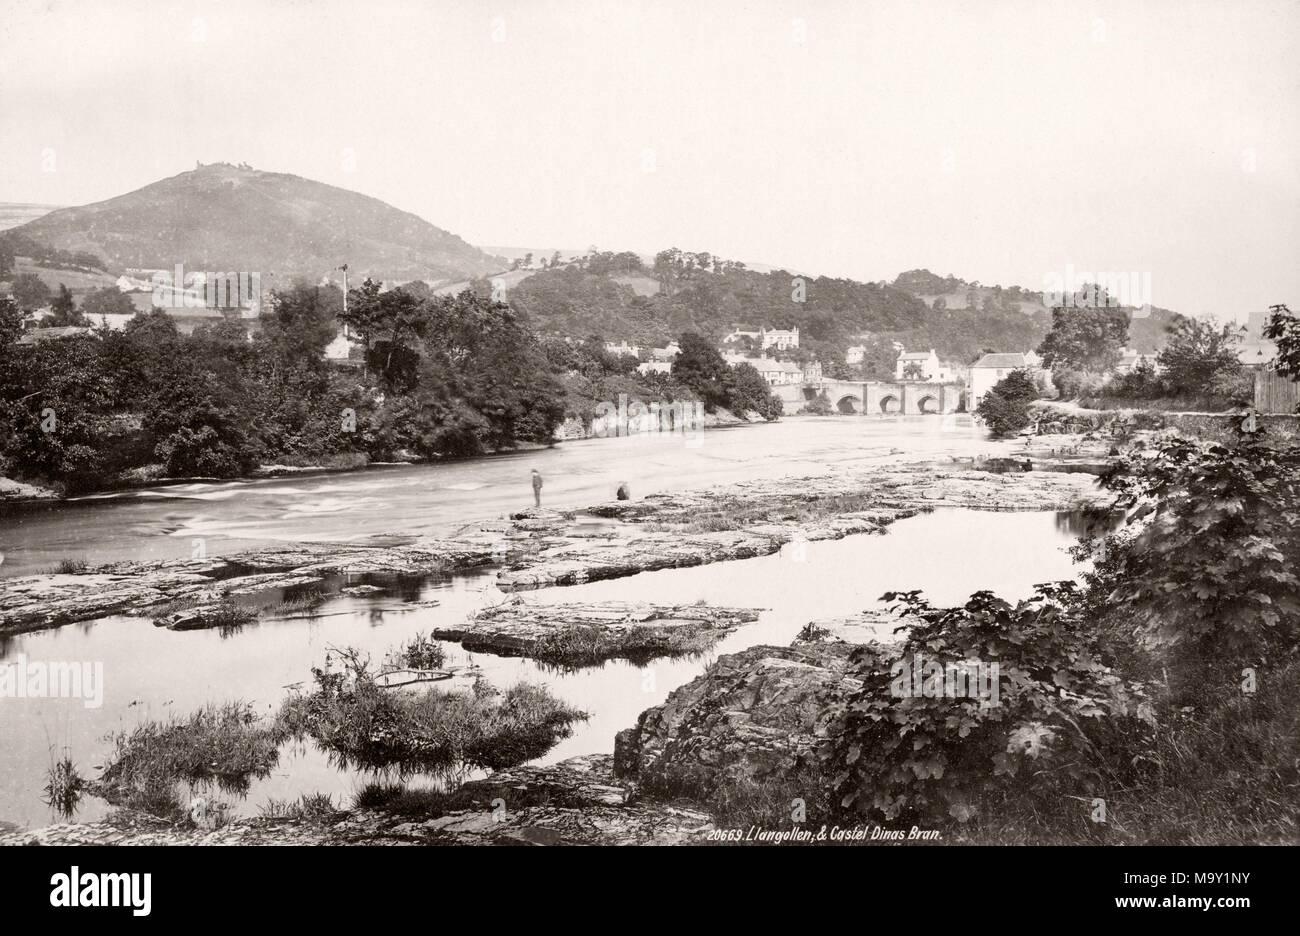 Vintage 19th century photograph - United Kingdom - Stock Photo